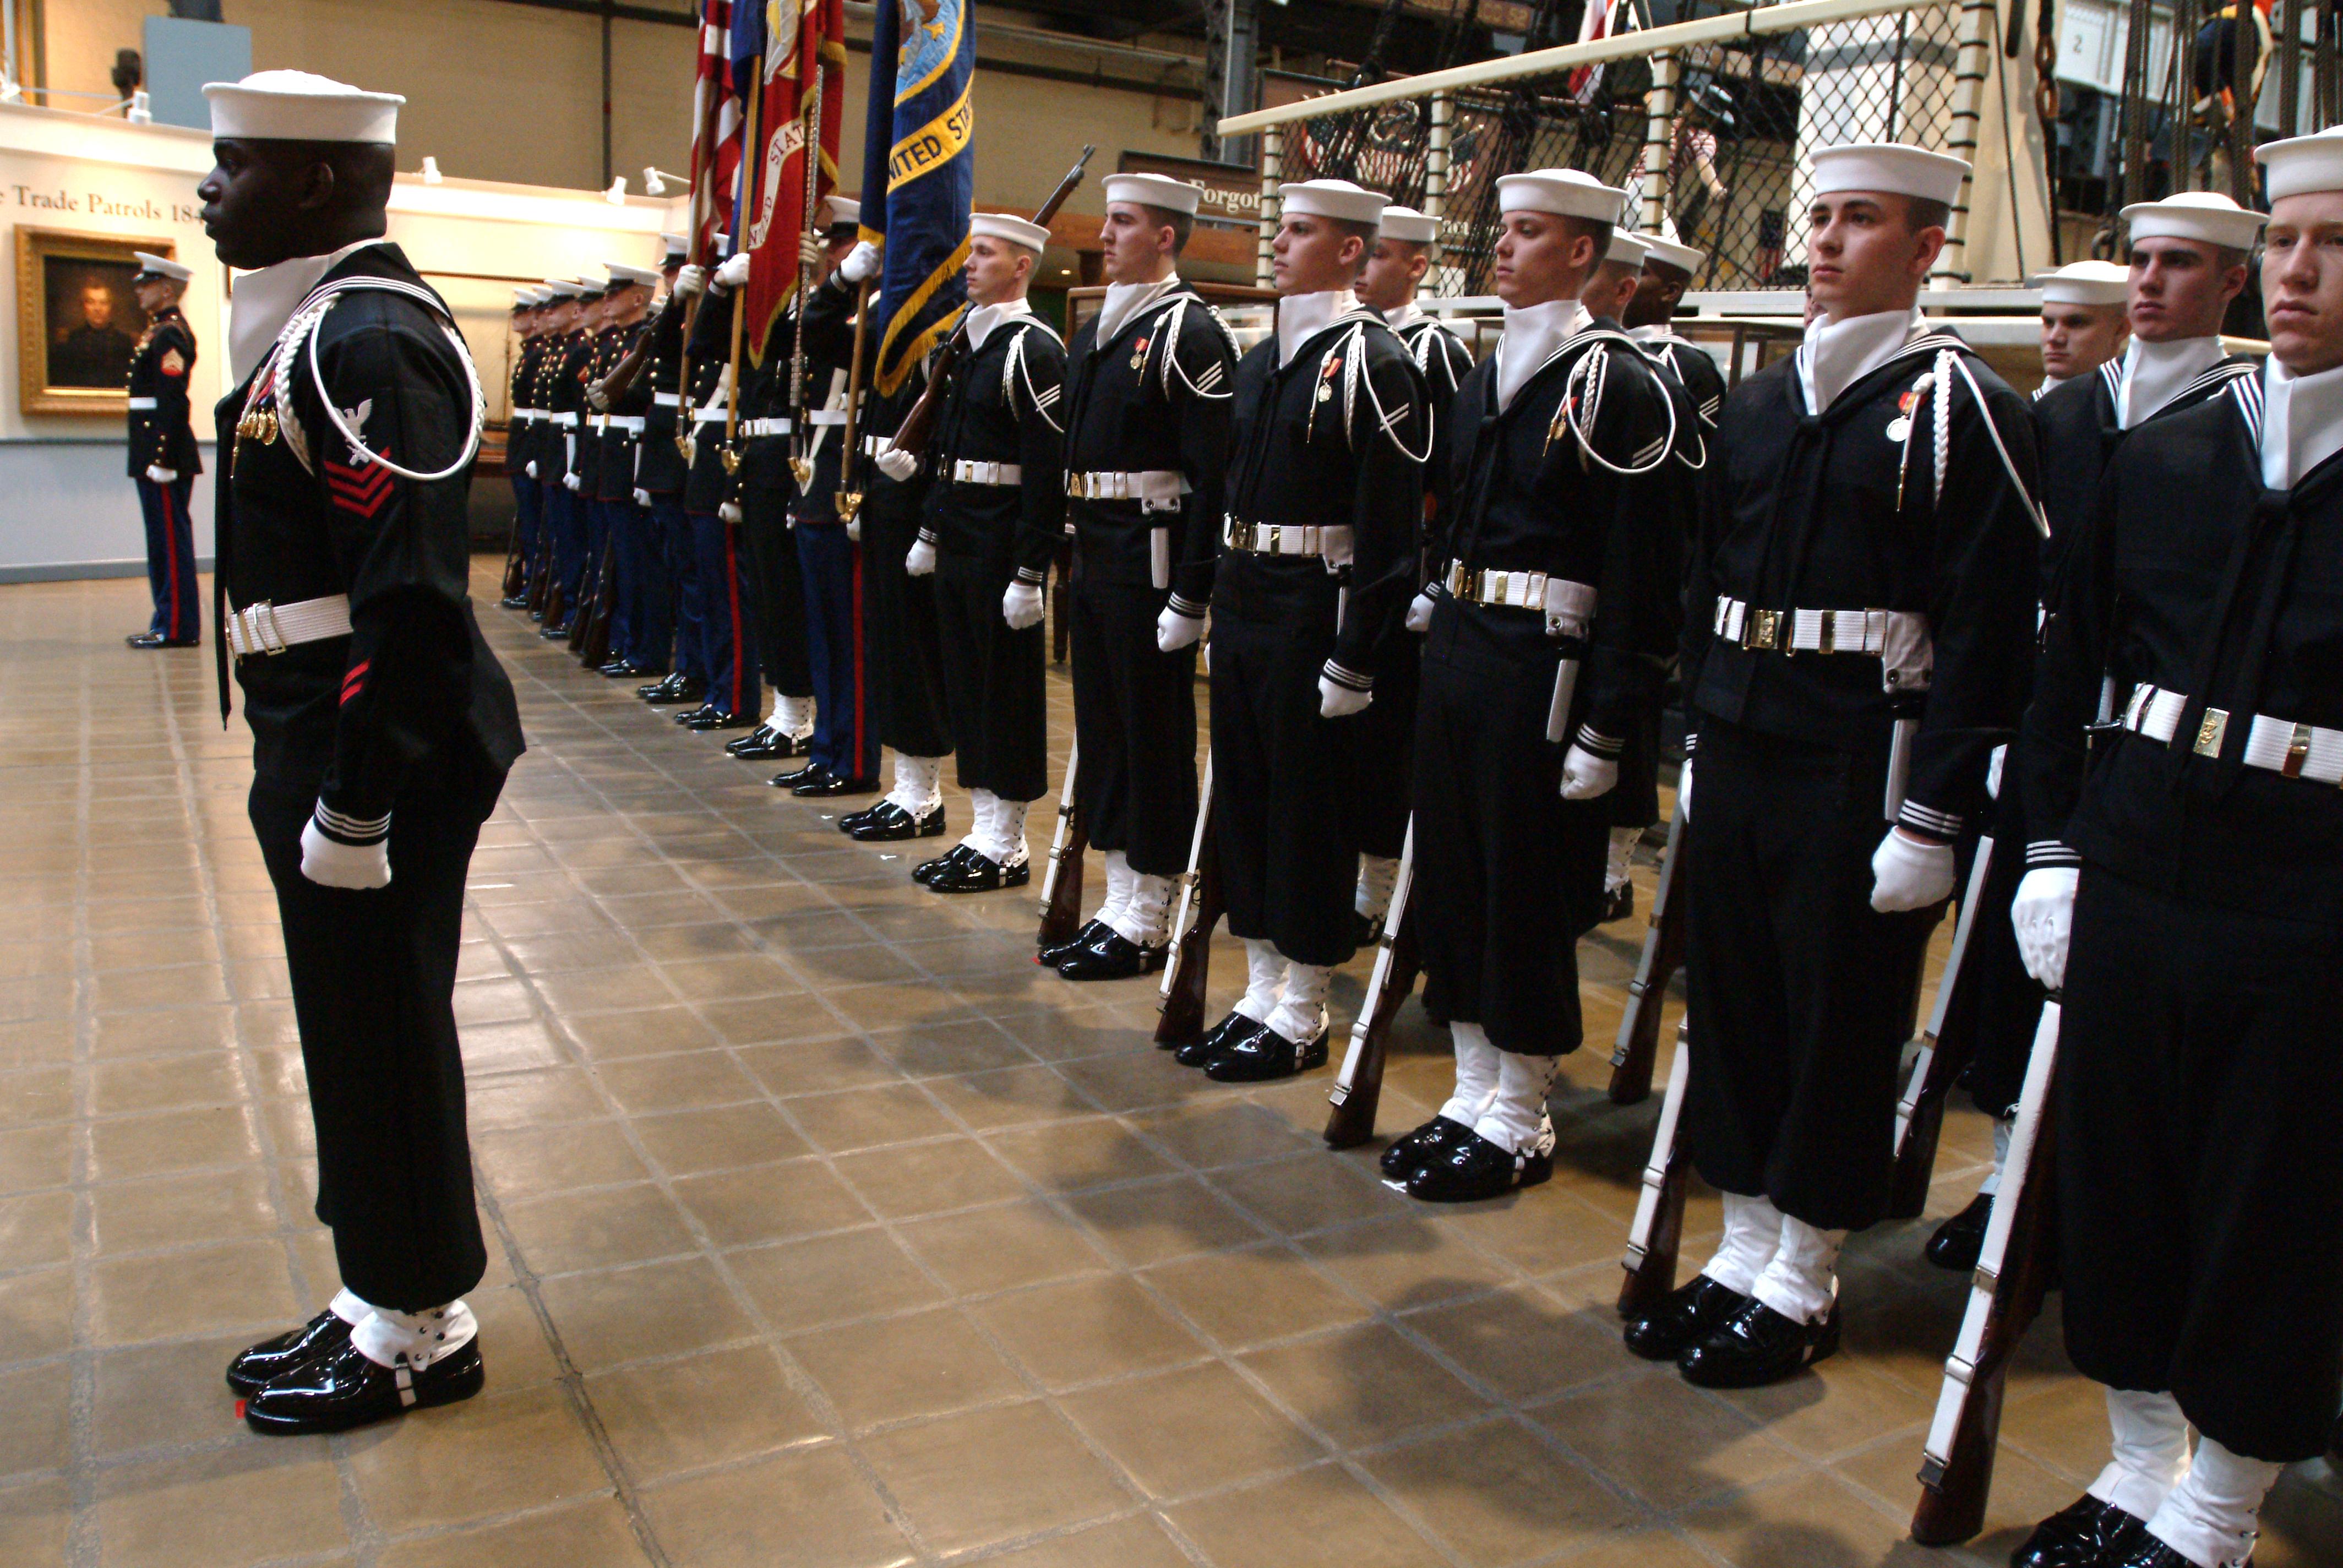 Fileus Navy 040226 N 2383b 038 Us Navy Ceremonial Guard Sailors - Us-navy-ceremonial-guard